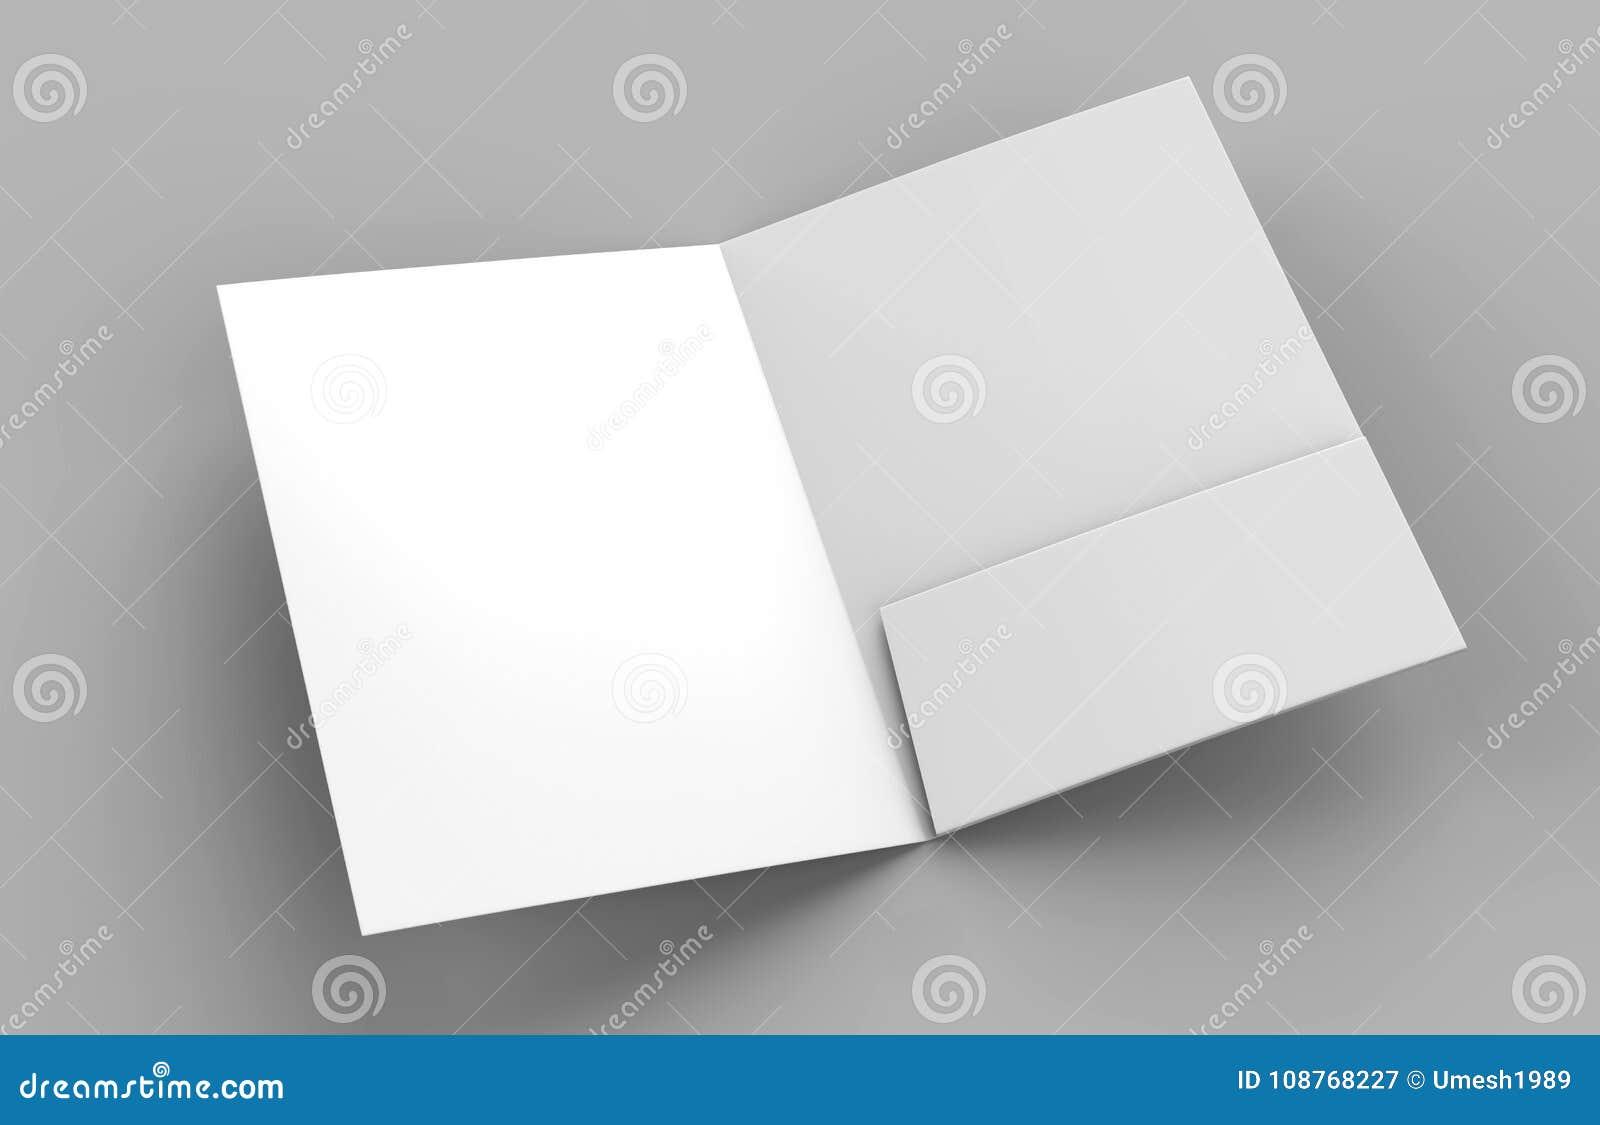 Blank white reinforced one pocket folders on grey background for mock up. 3D rendering.